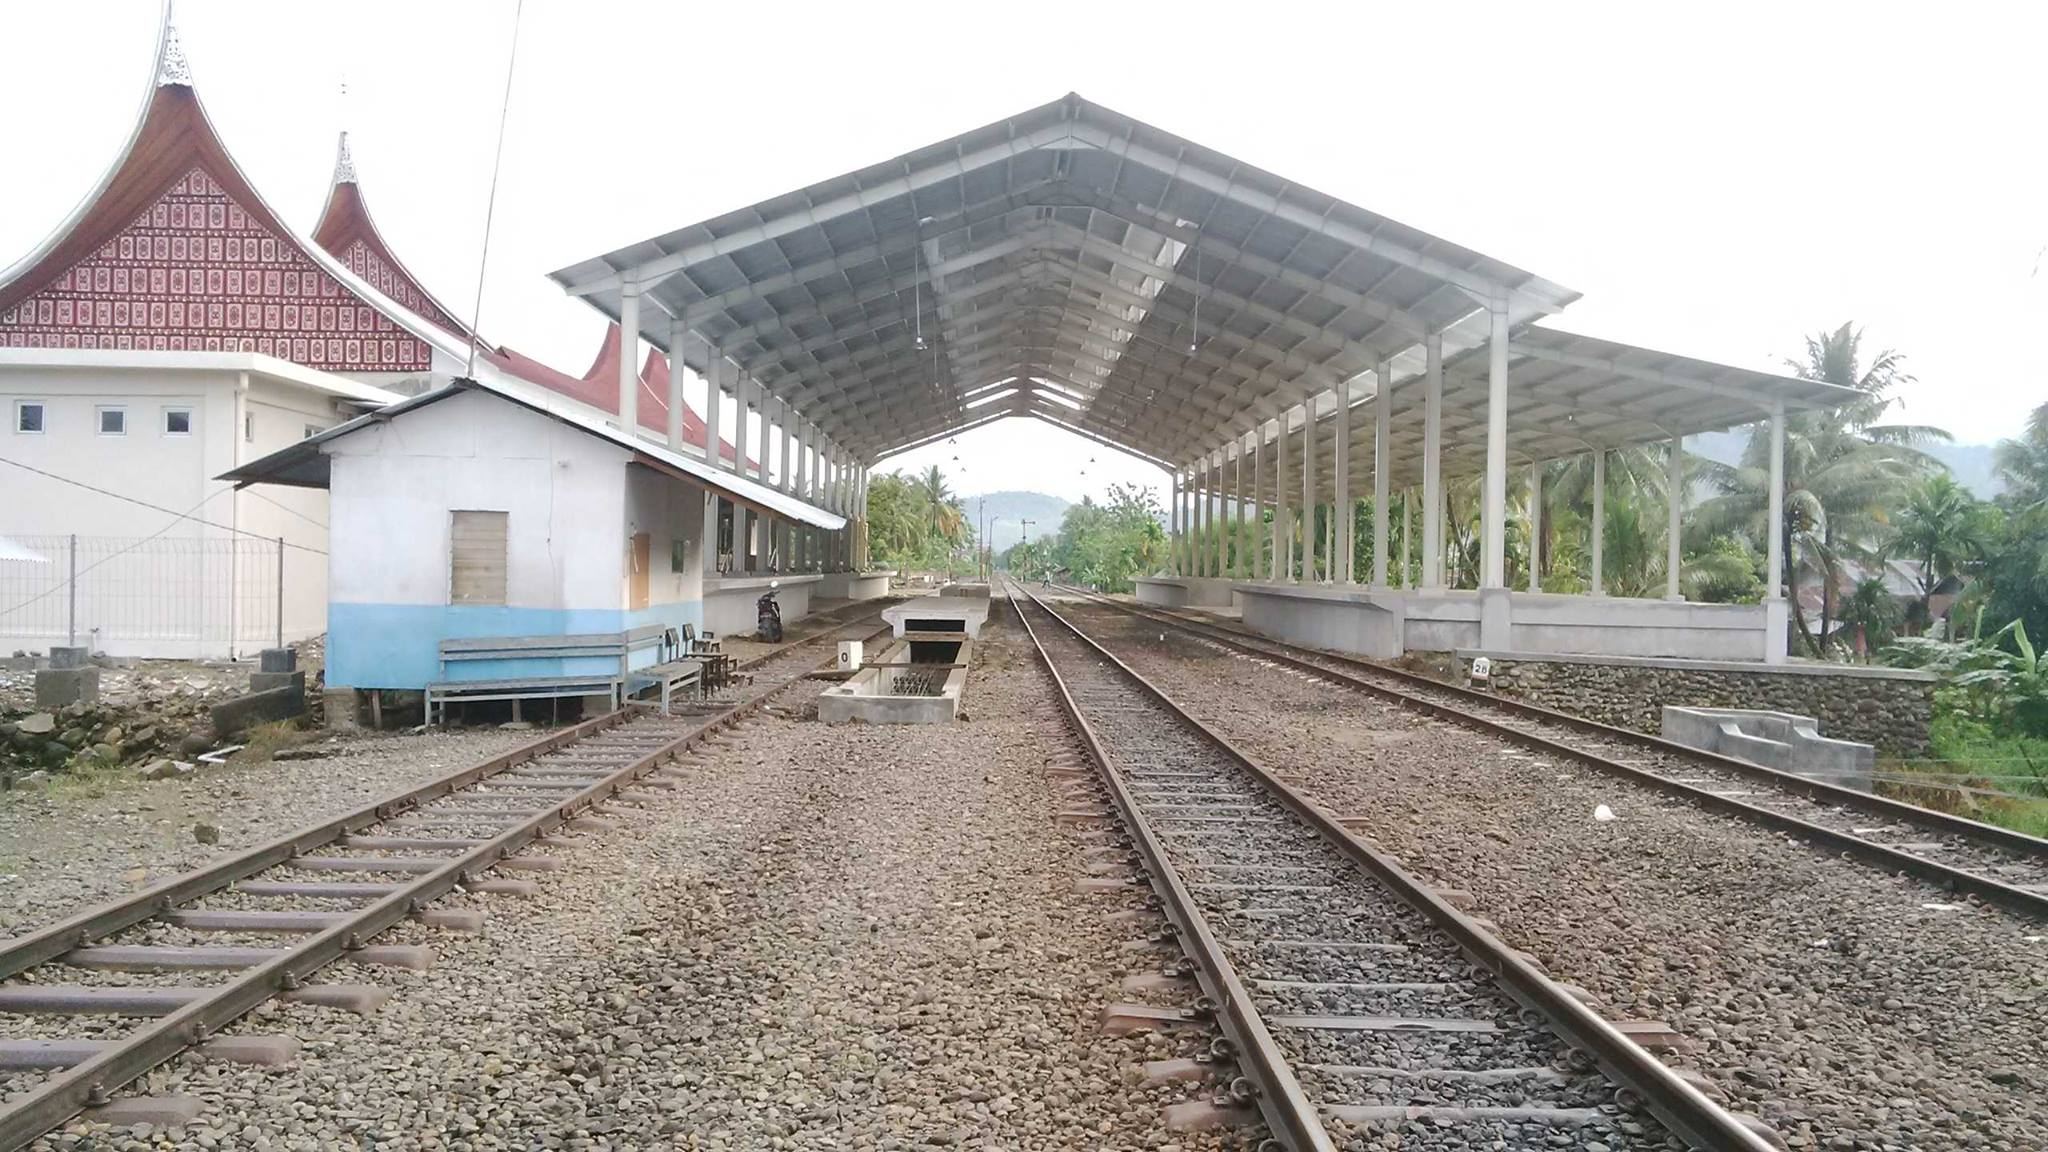 Stasiun Kereta Api Duku, tempat transit penumpang KA menuju Bandara Internasional Minangkabau.